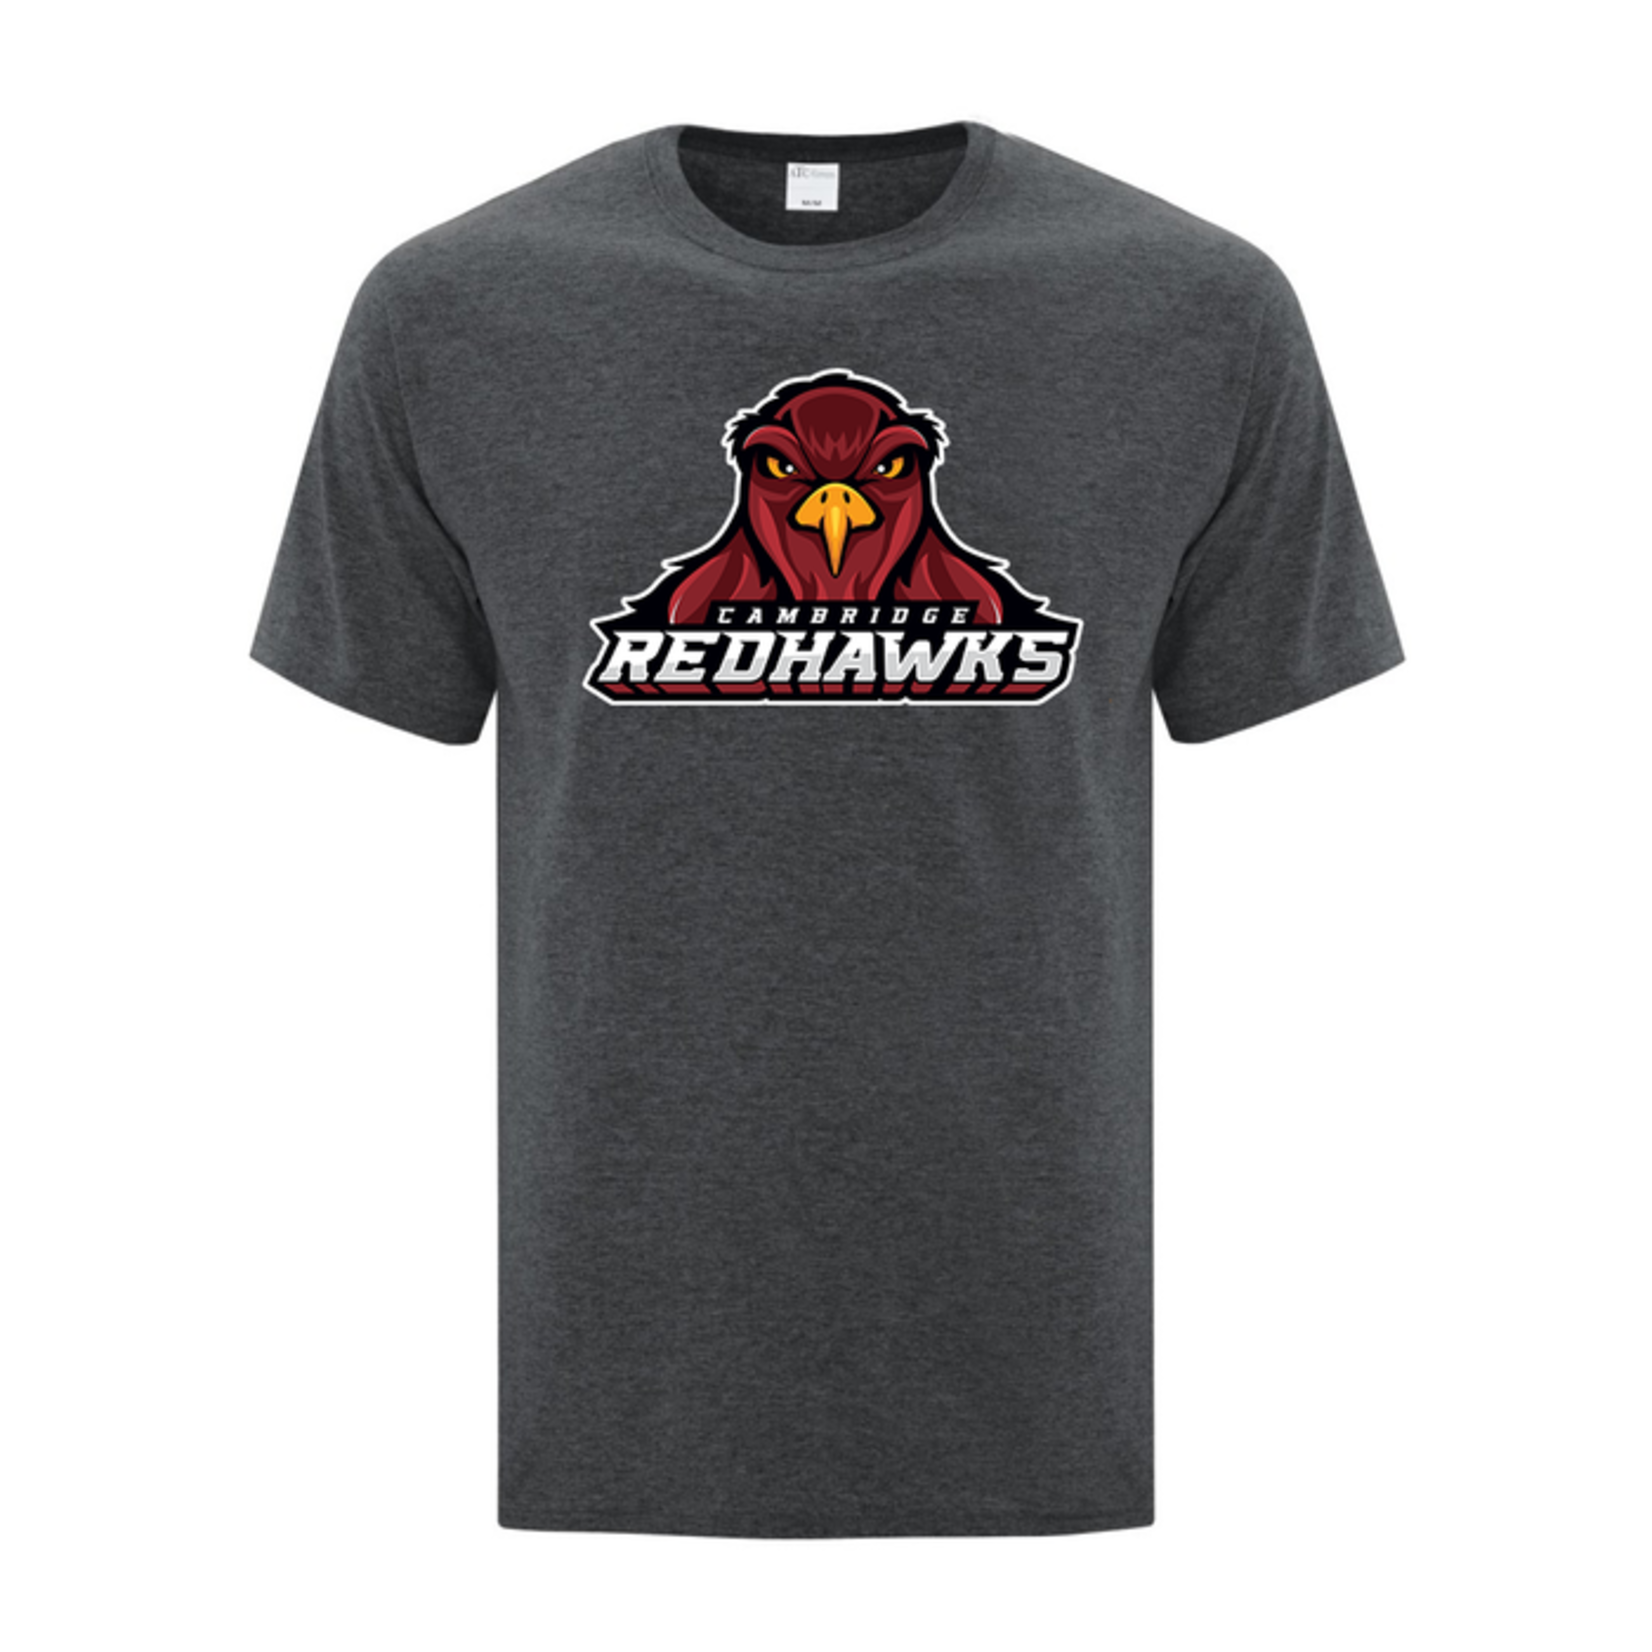 ATC Redhawks T-Shirt - Adult